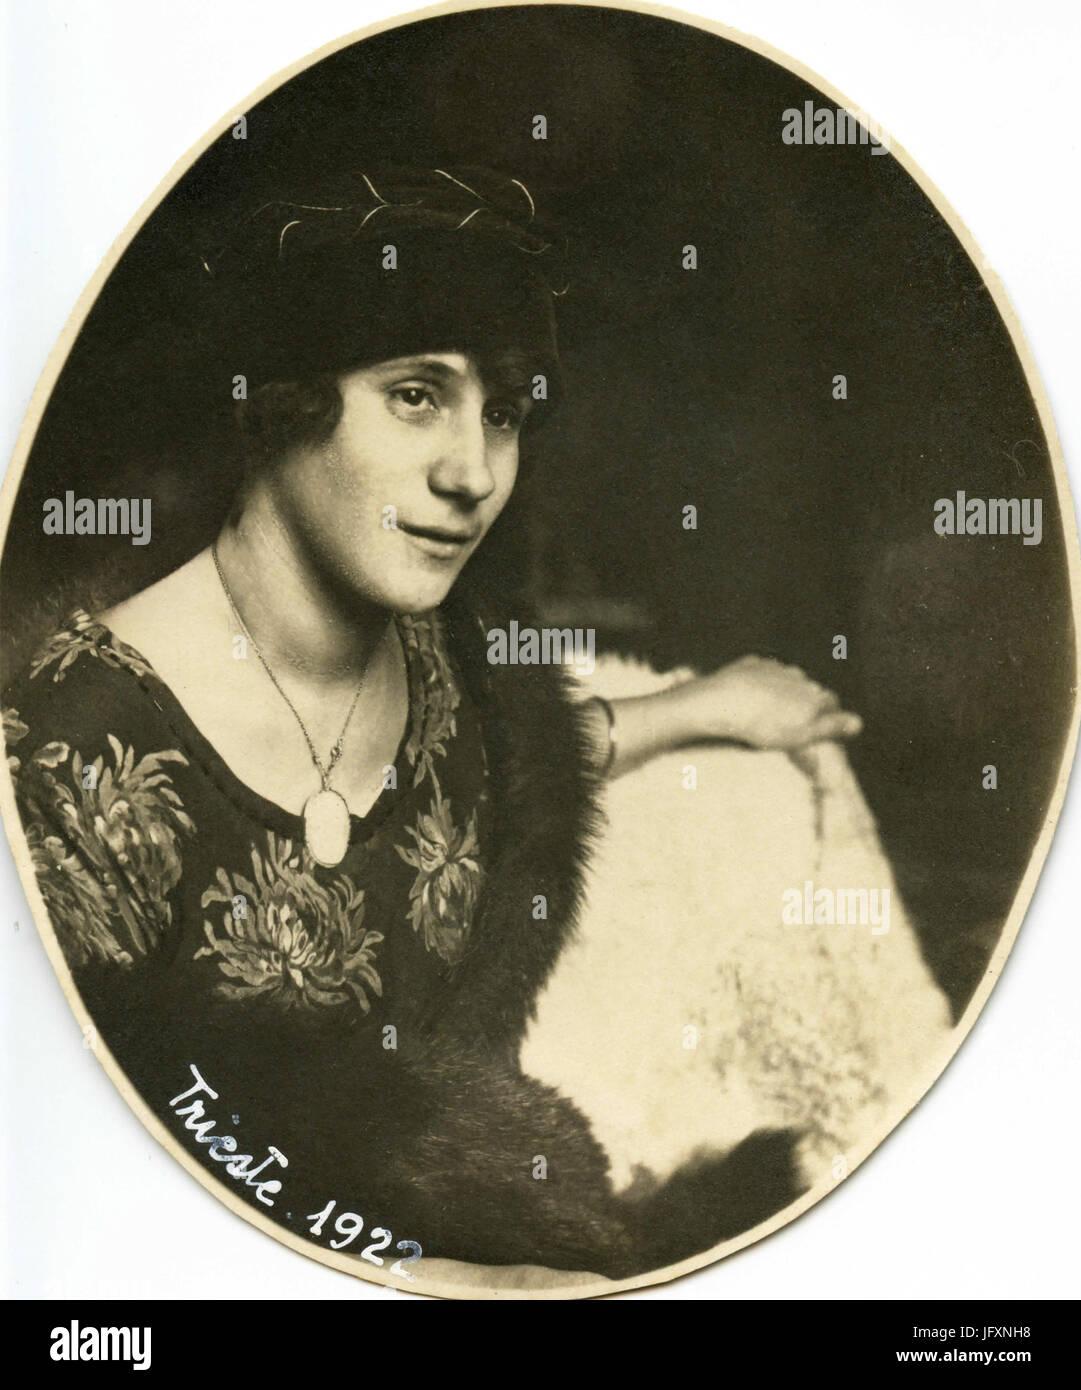 Ovales Porträt Frau mit Pendent, Italien 1922 Stockbild